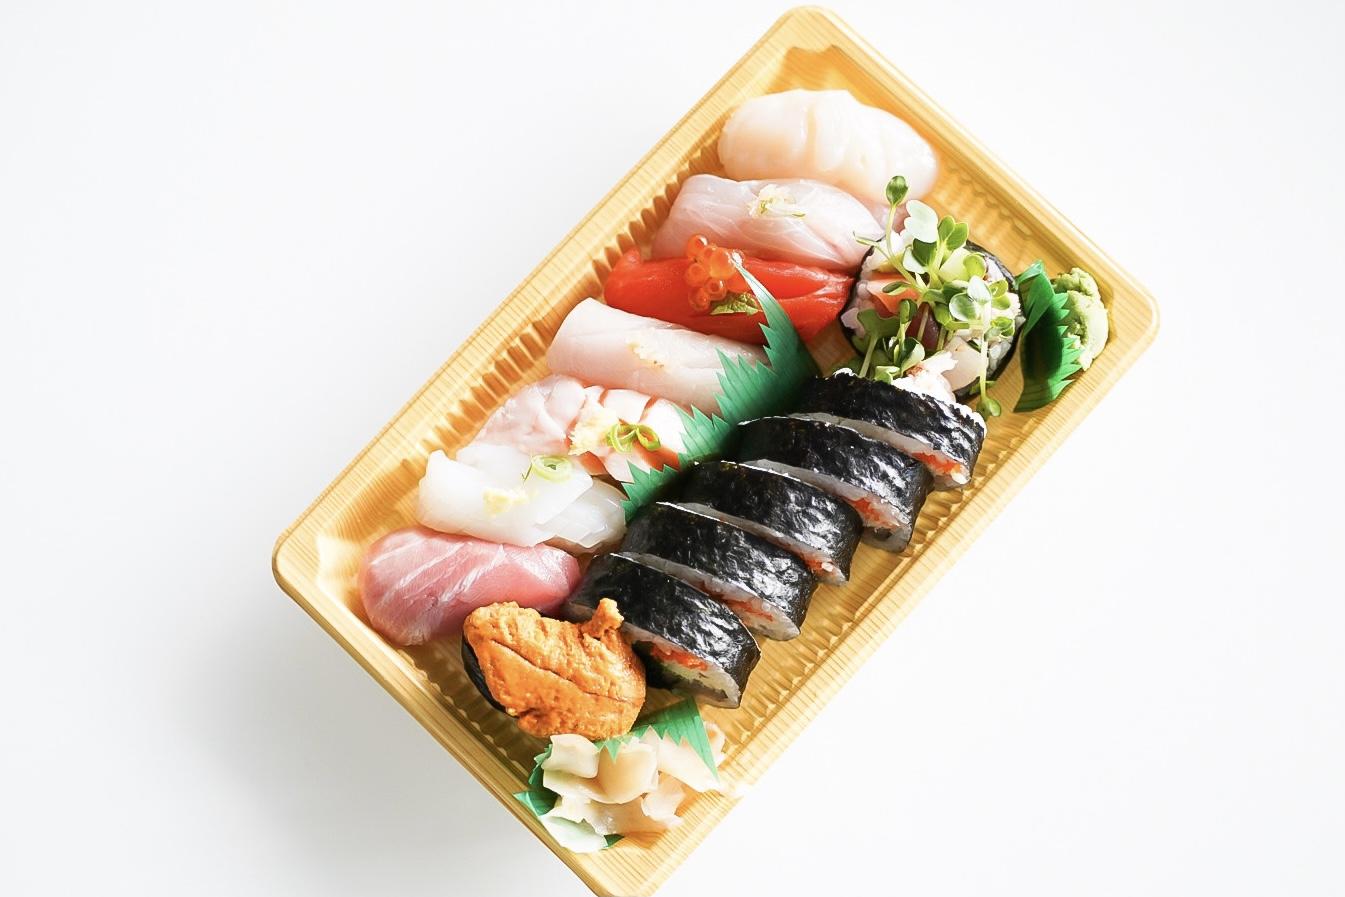 Nigiri Premium @ Sashimiya - from the top counter-clockwise: Hotate, Kanpachi, Sockeye Salmon, Hamachi, Atlantic Salmon Belly, Ika, Chutoro, Uni.